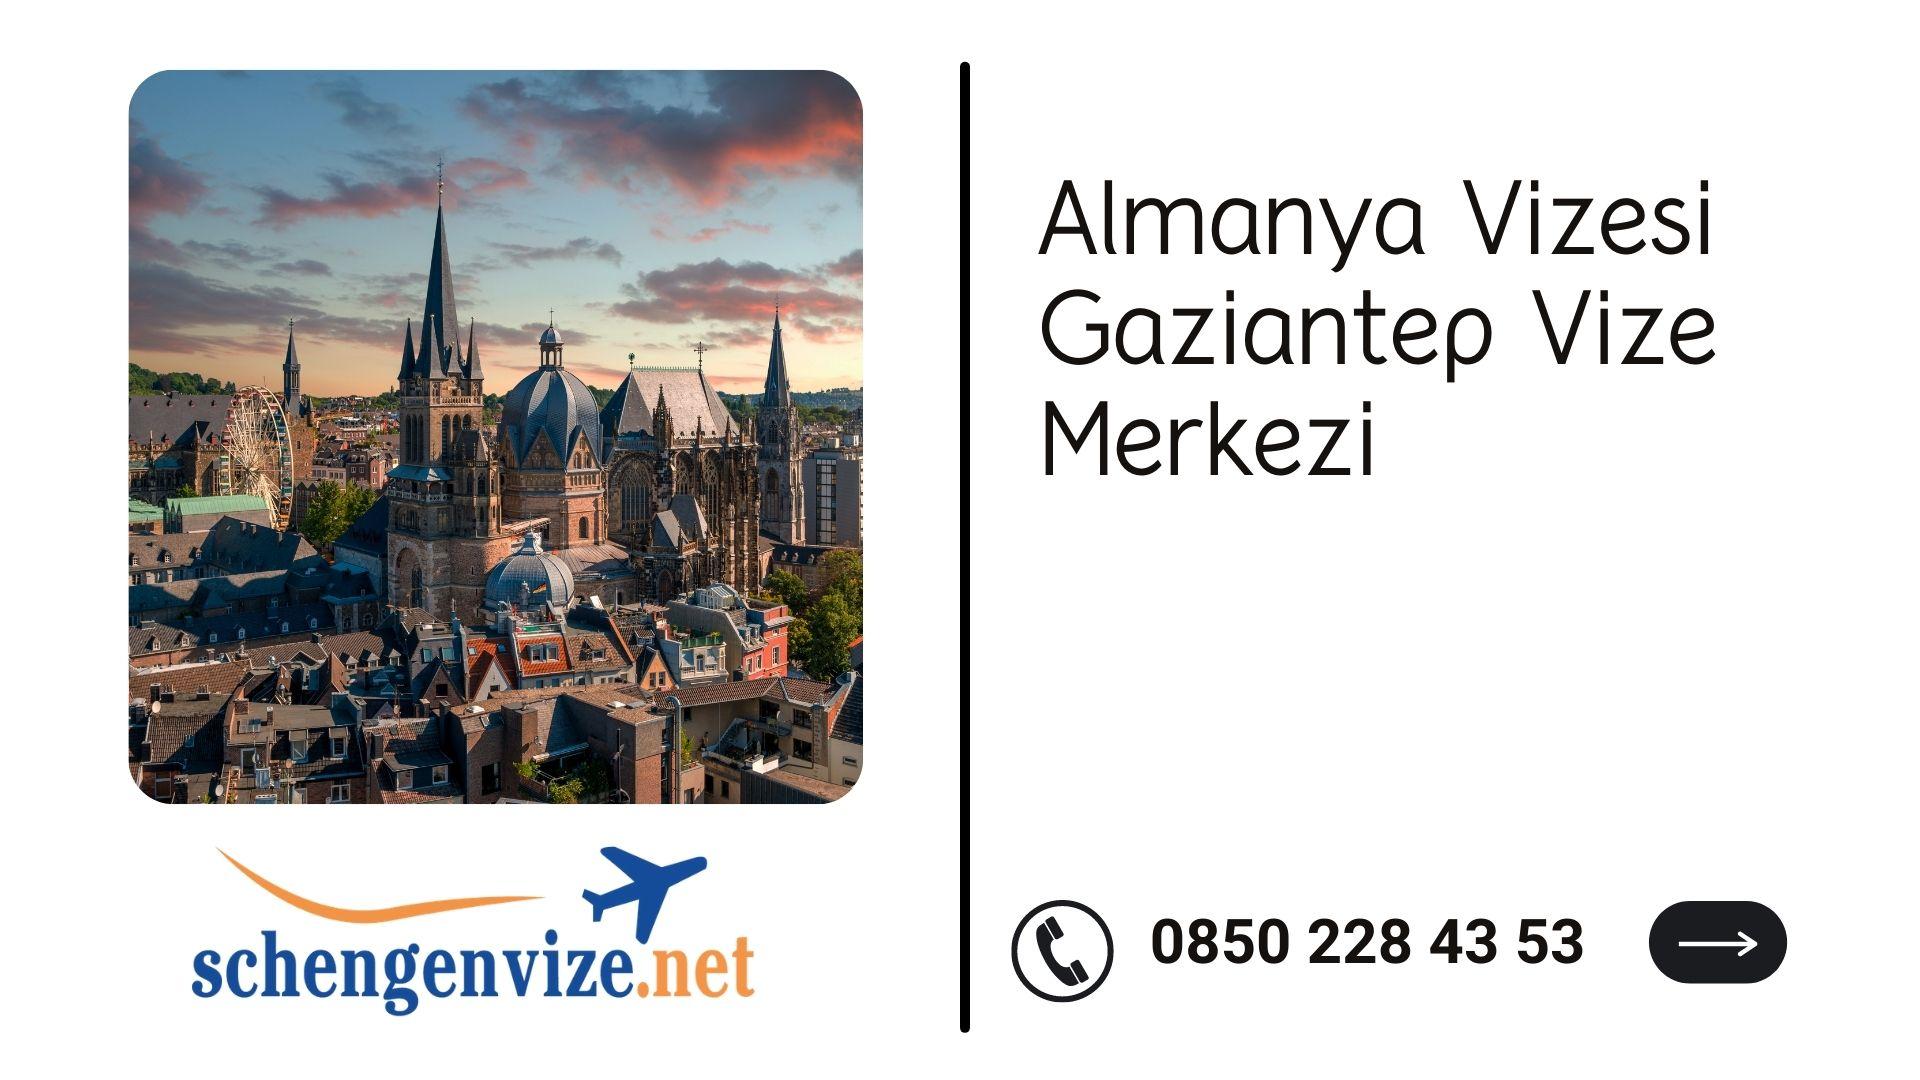 Almanya Vizesi Gaziantep Vize Merkezi